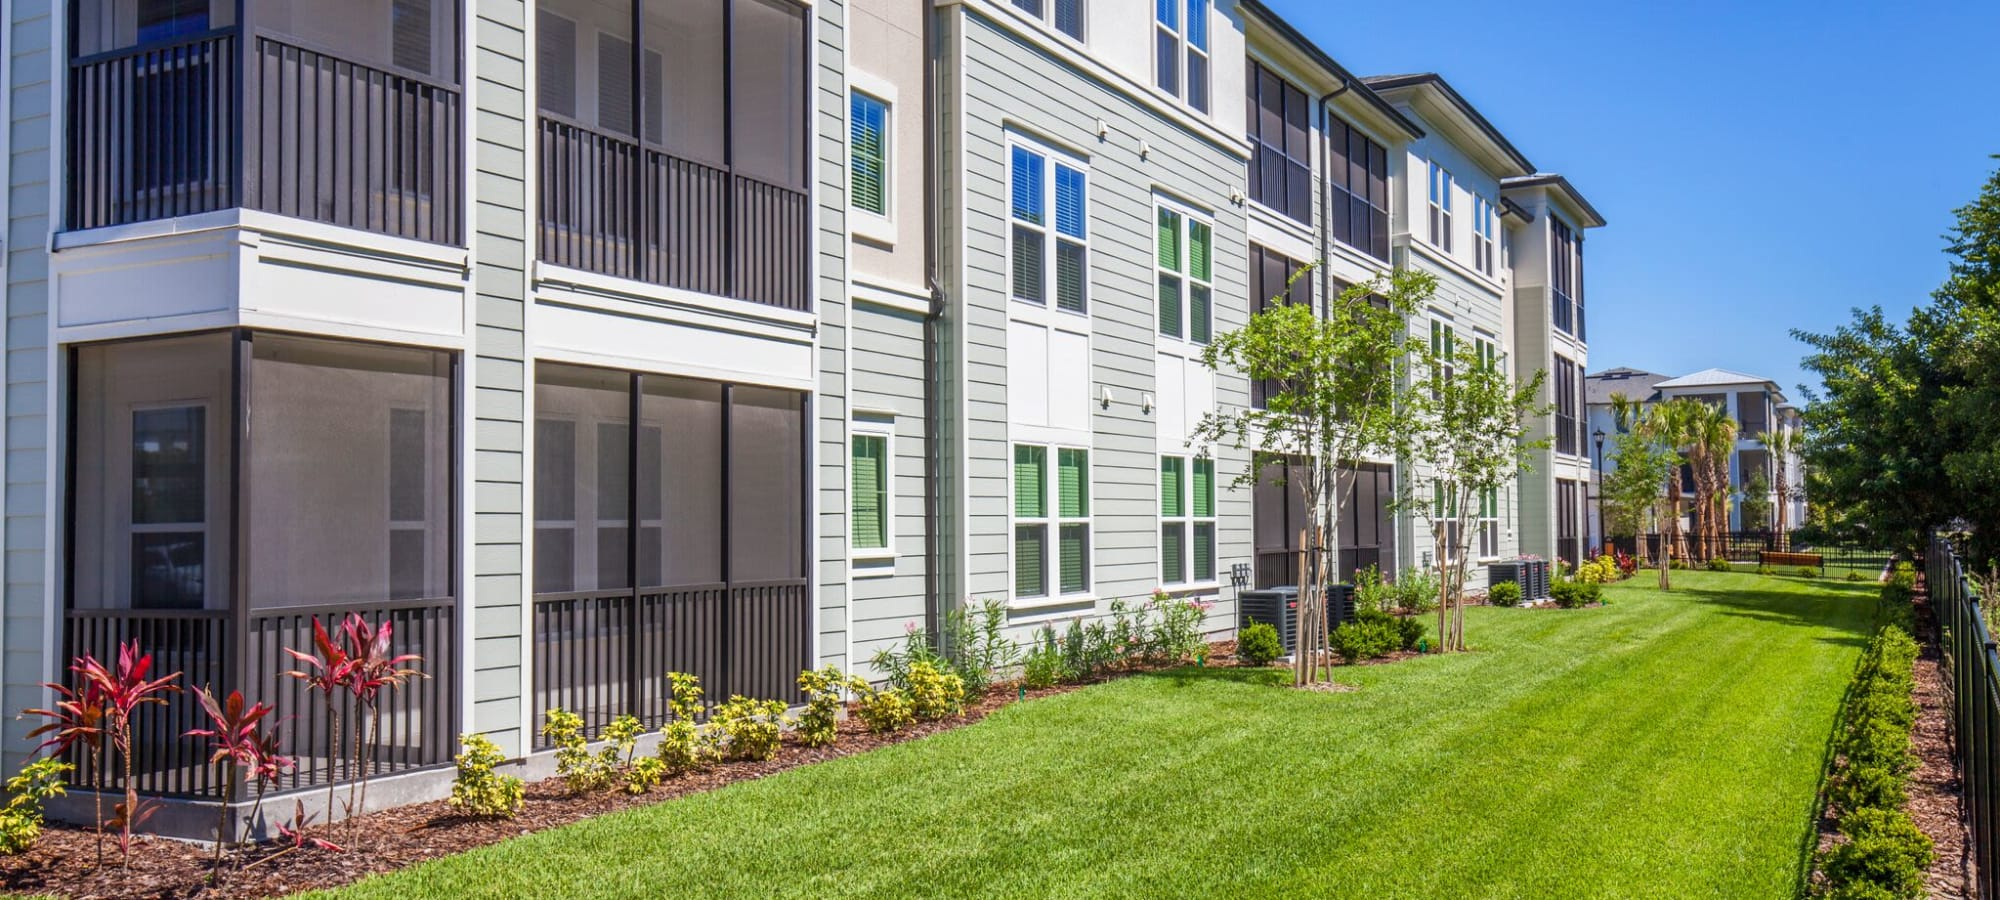 Apartments in Orlando, Florida at Linden Audubon Park